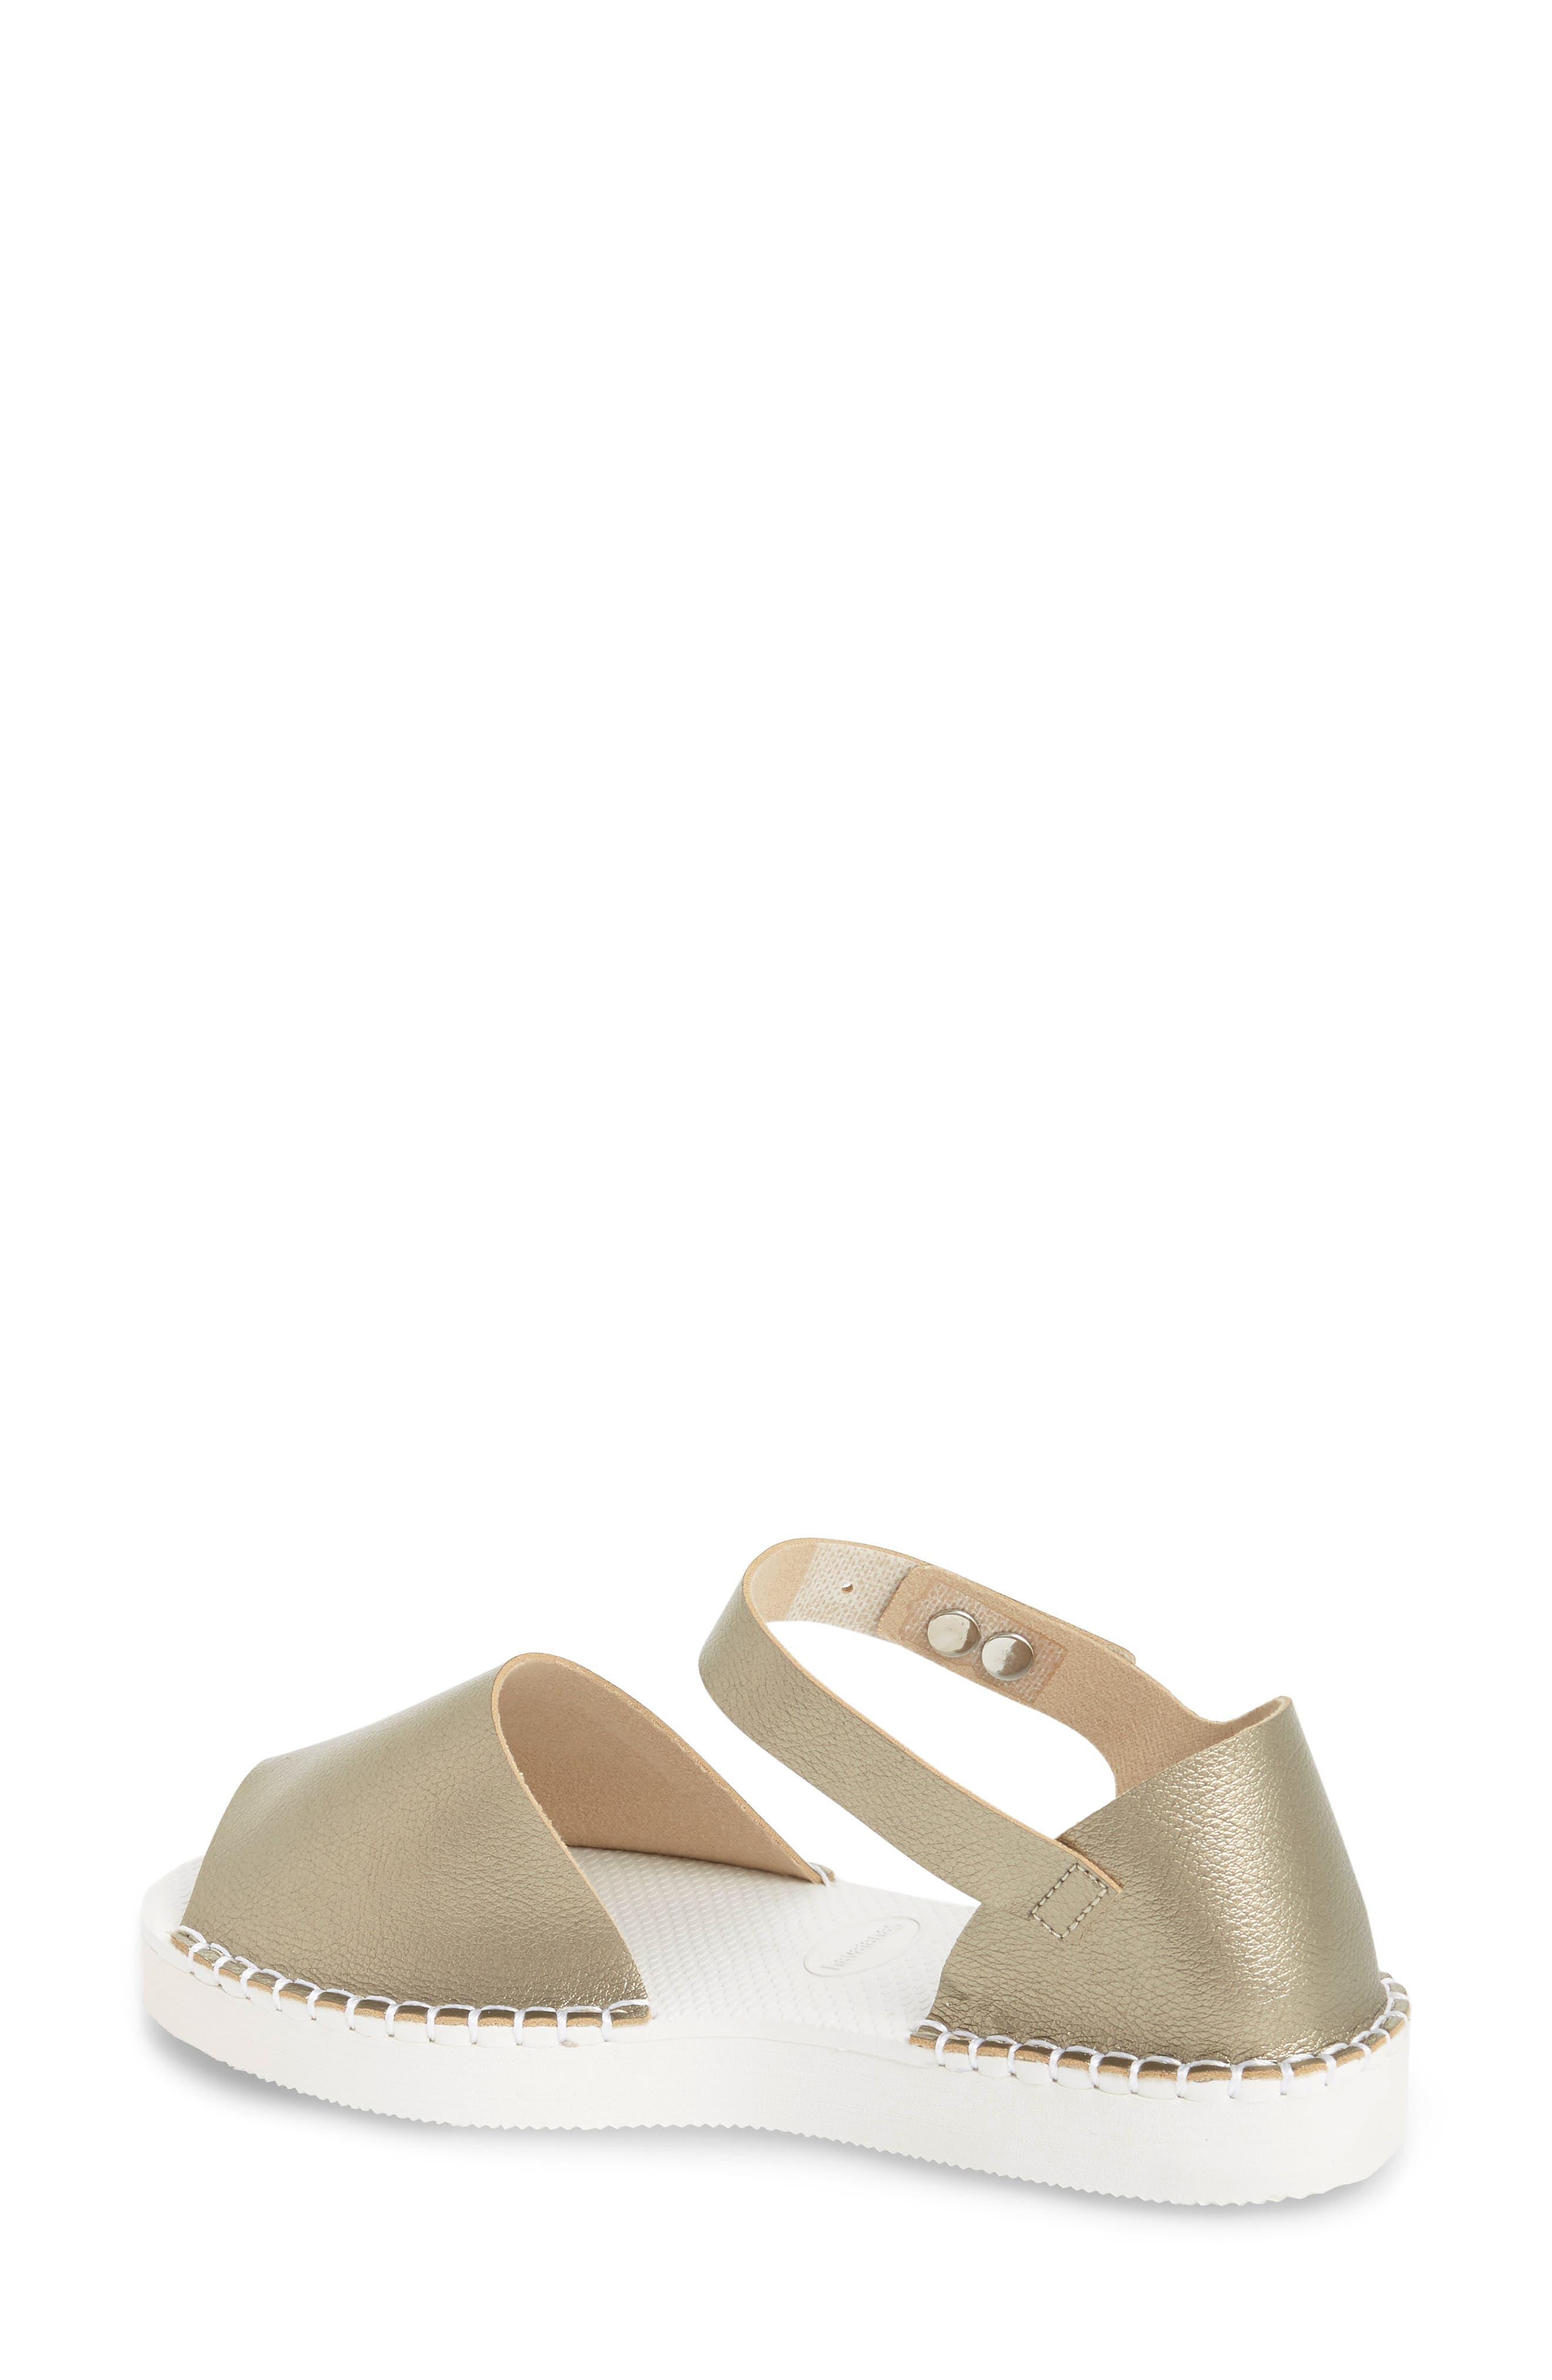 Flatform Fashion Sandal,                             Alternate thumbnail 2, color,                             Golden